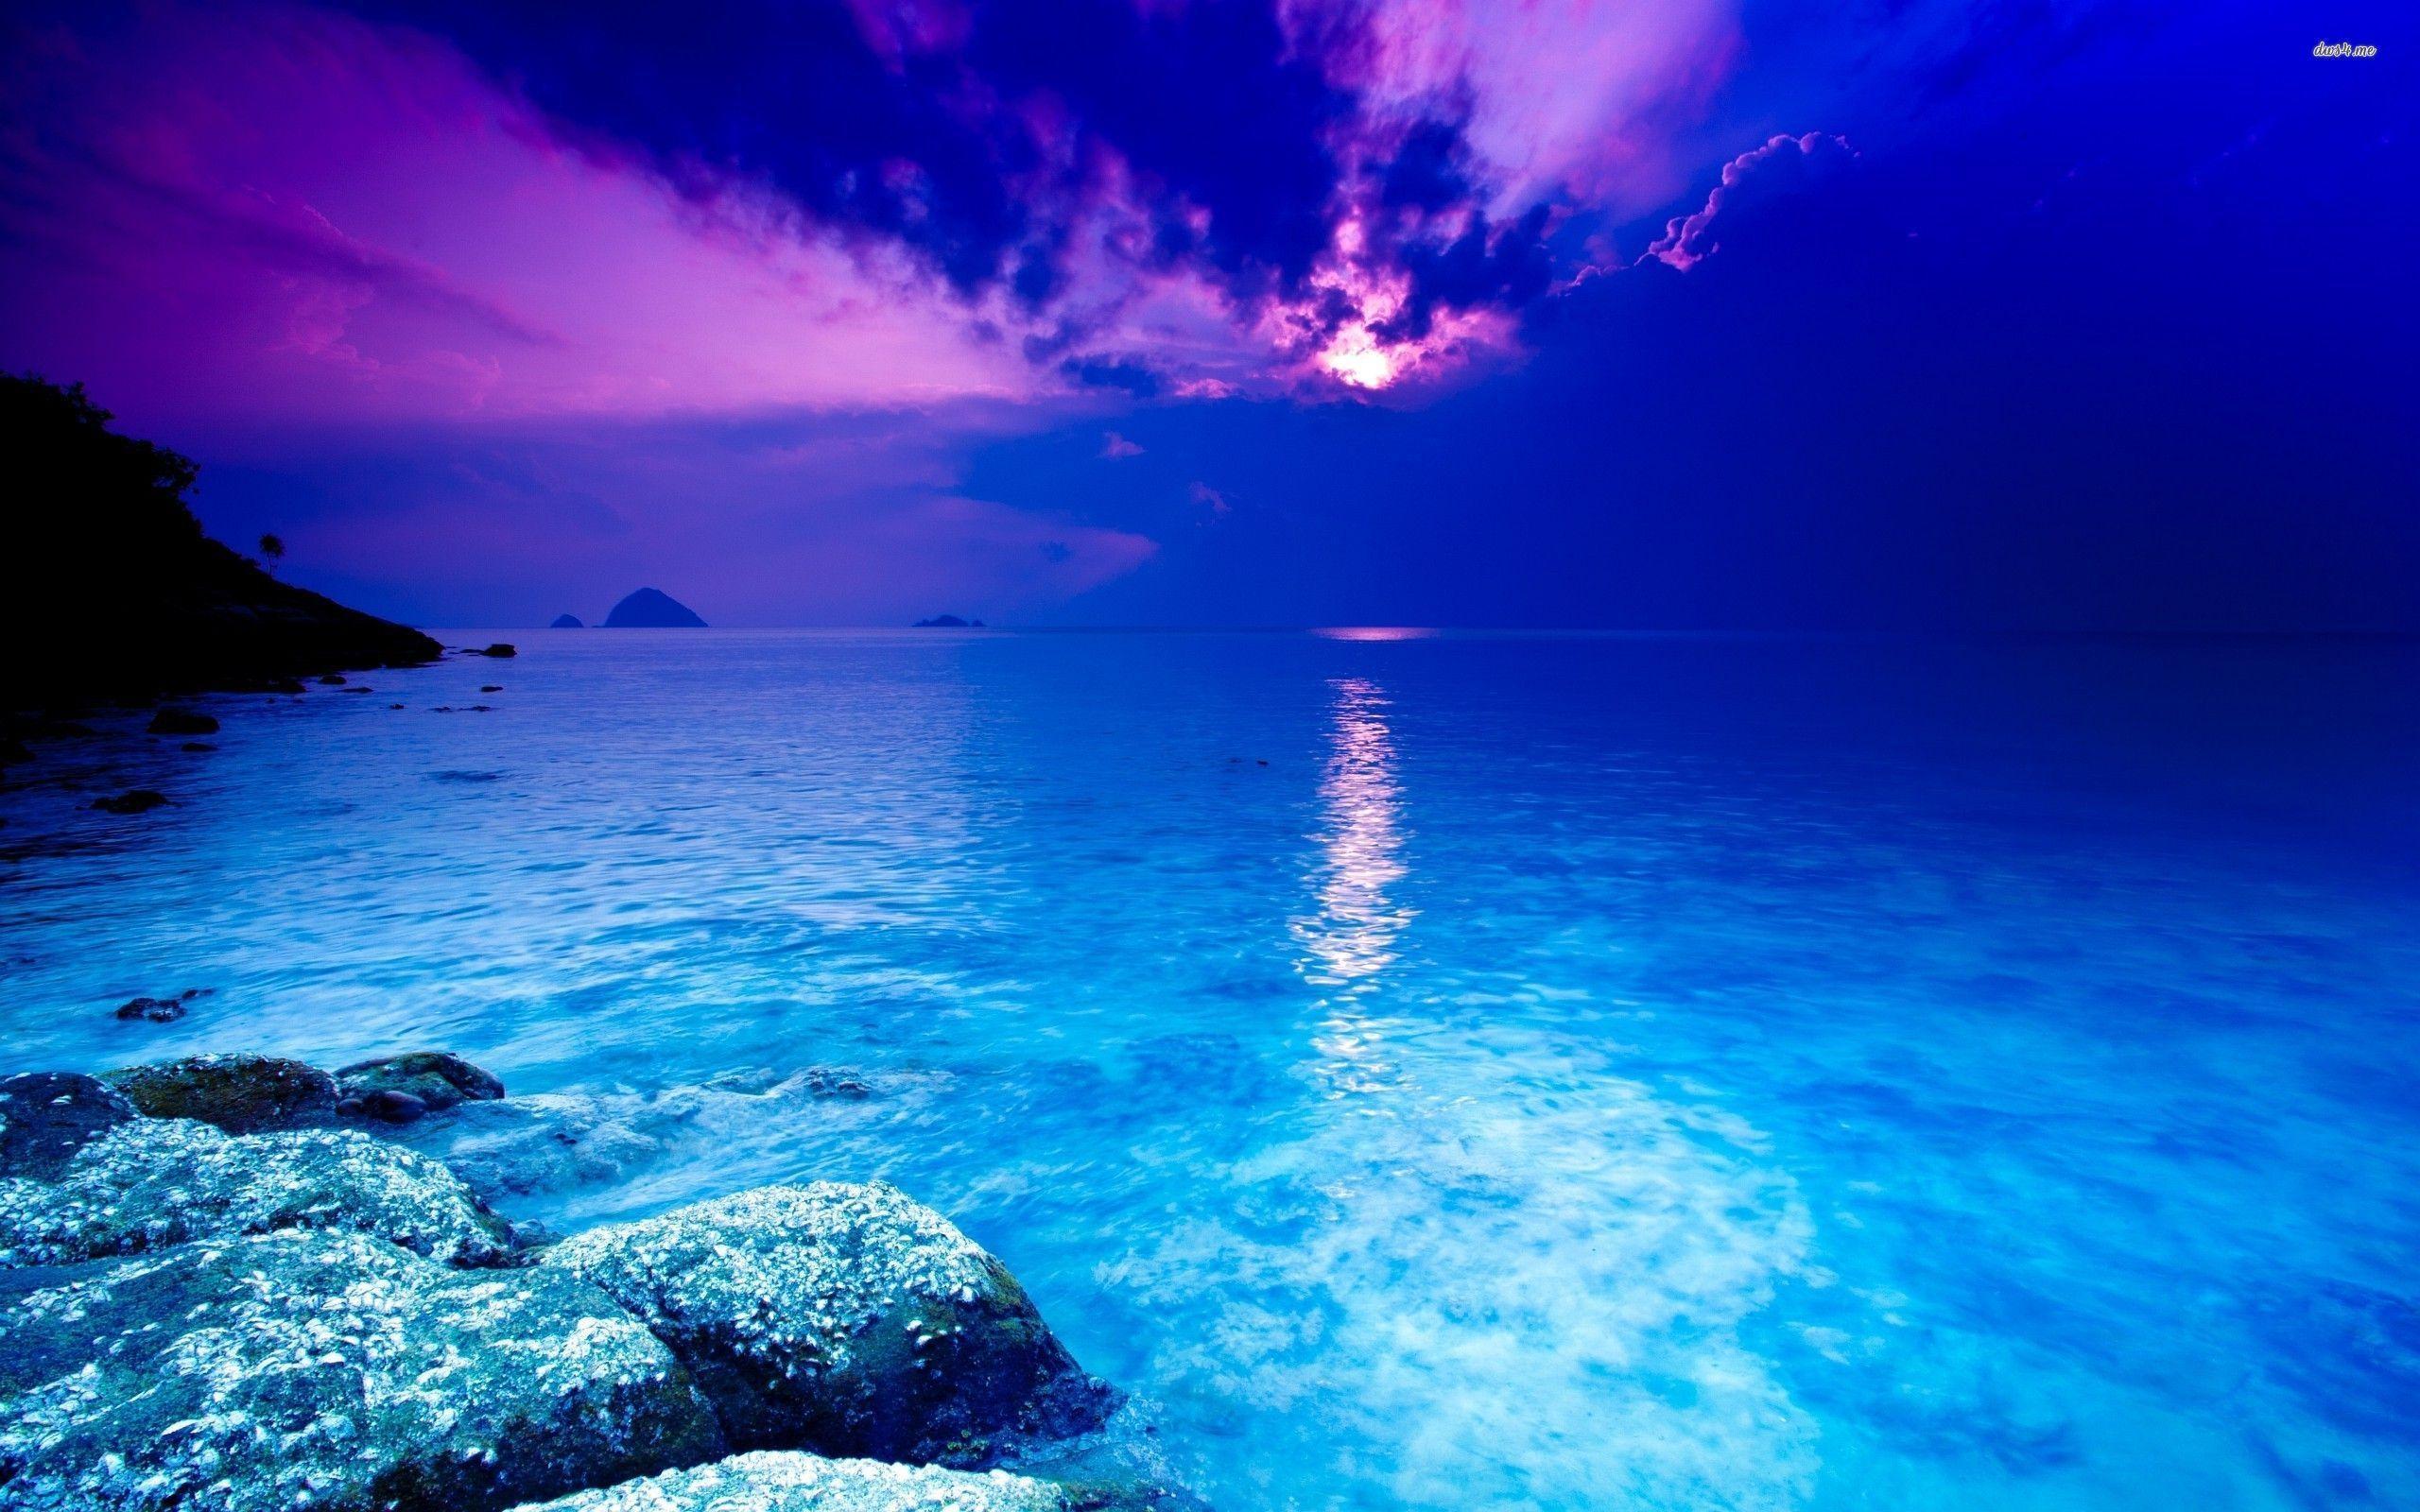 Blue Ocean Backgrounds 2560x1600